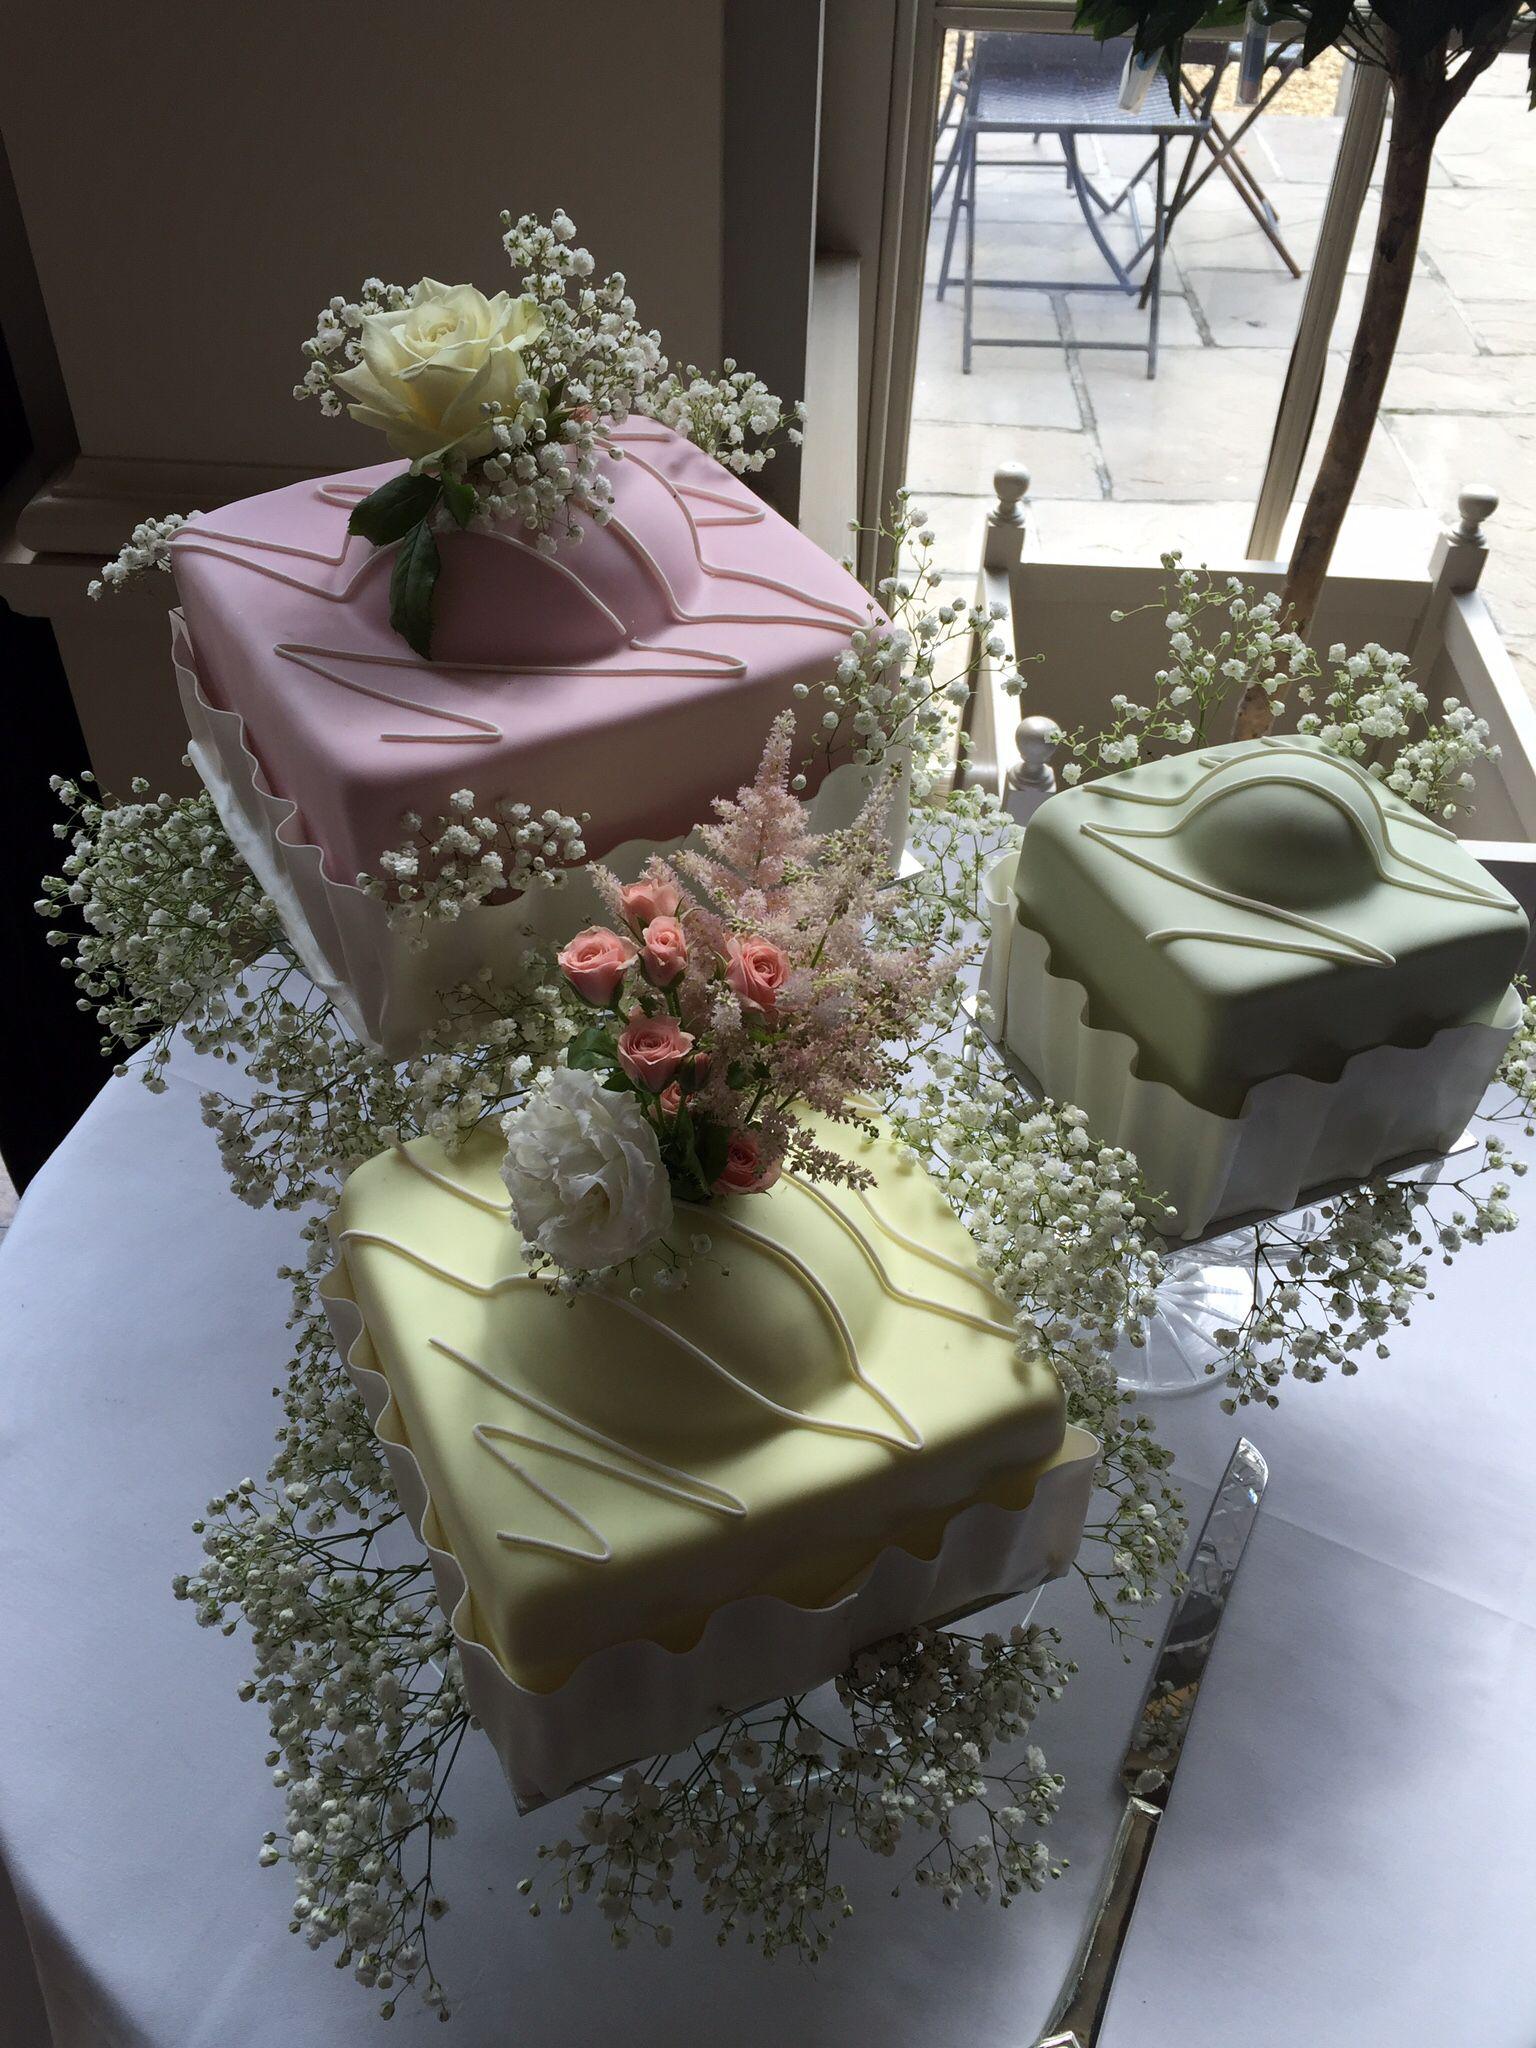 Giant French Fancy Wedding Cake Fancy Wedding Cakes Pink